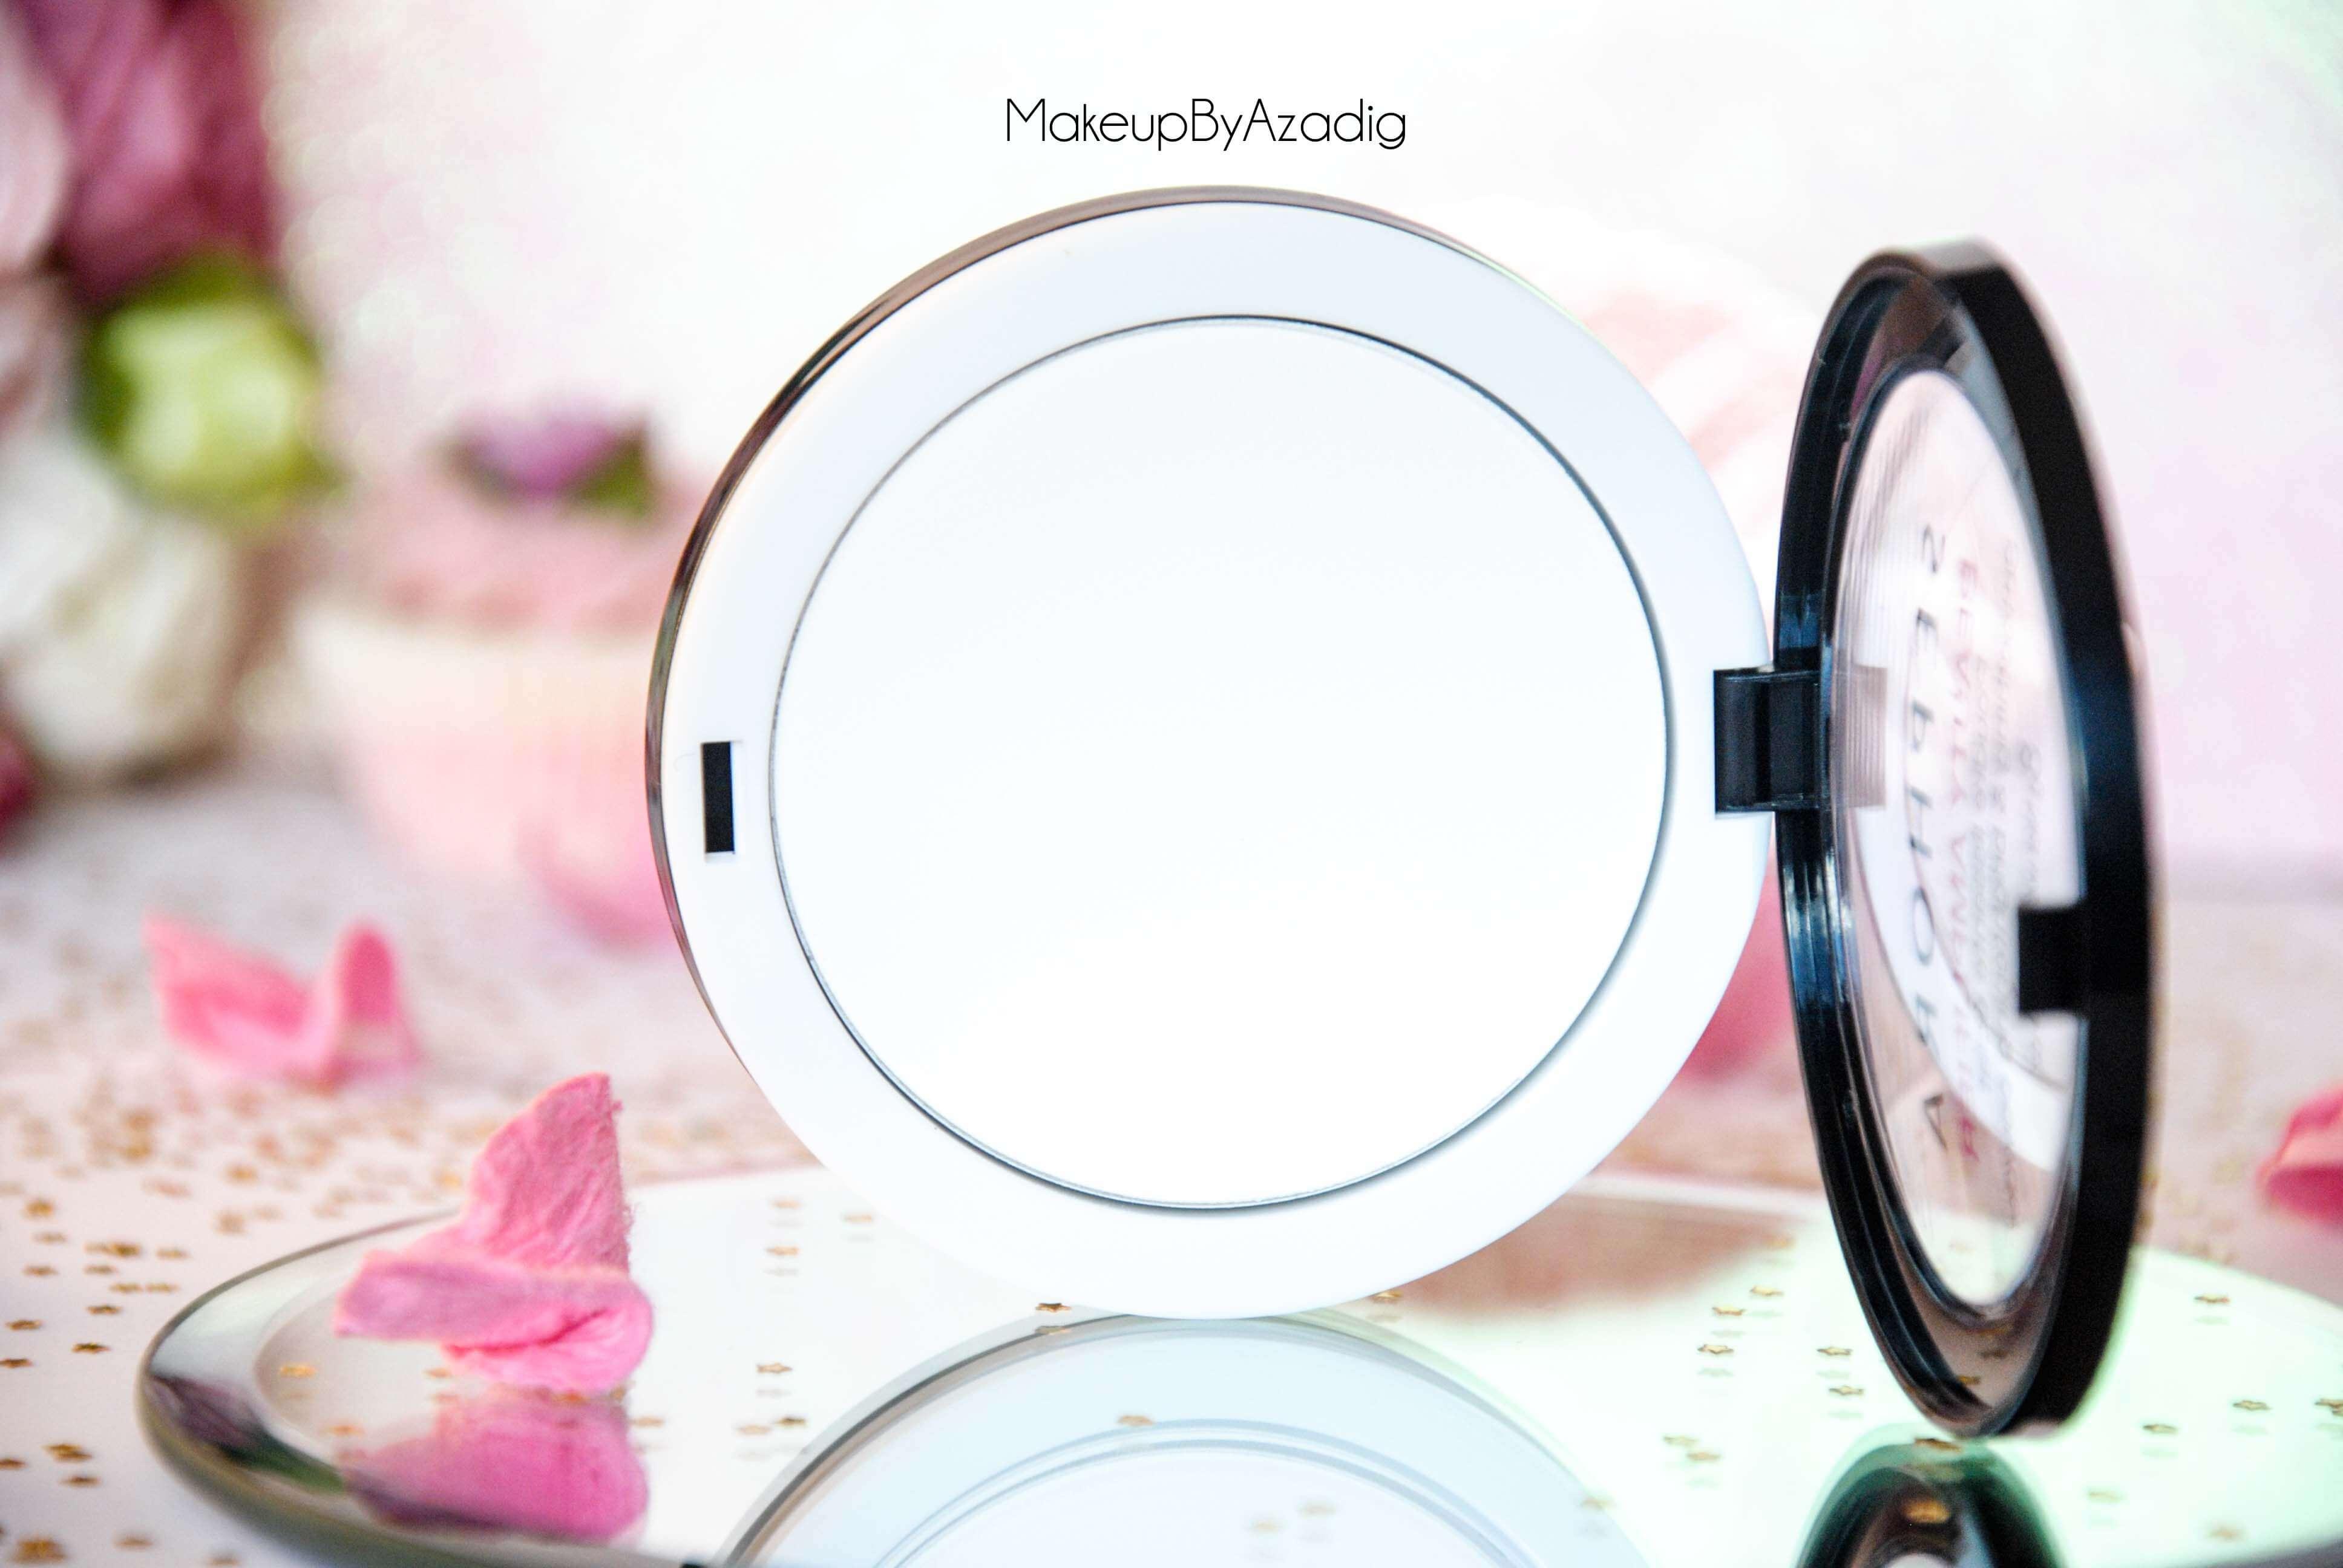 poudre-matifiante-beauty-amplifier-sephora-paris-makeupbyazadig-troyes-revue-avis-prix-teinte